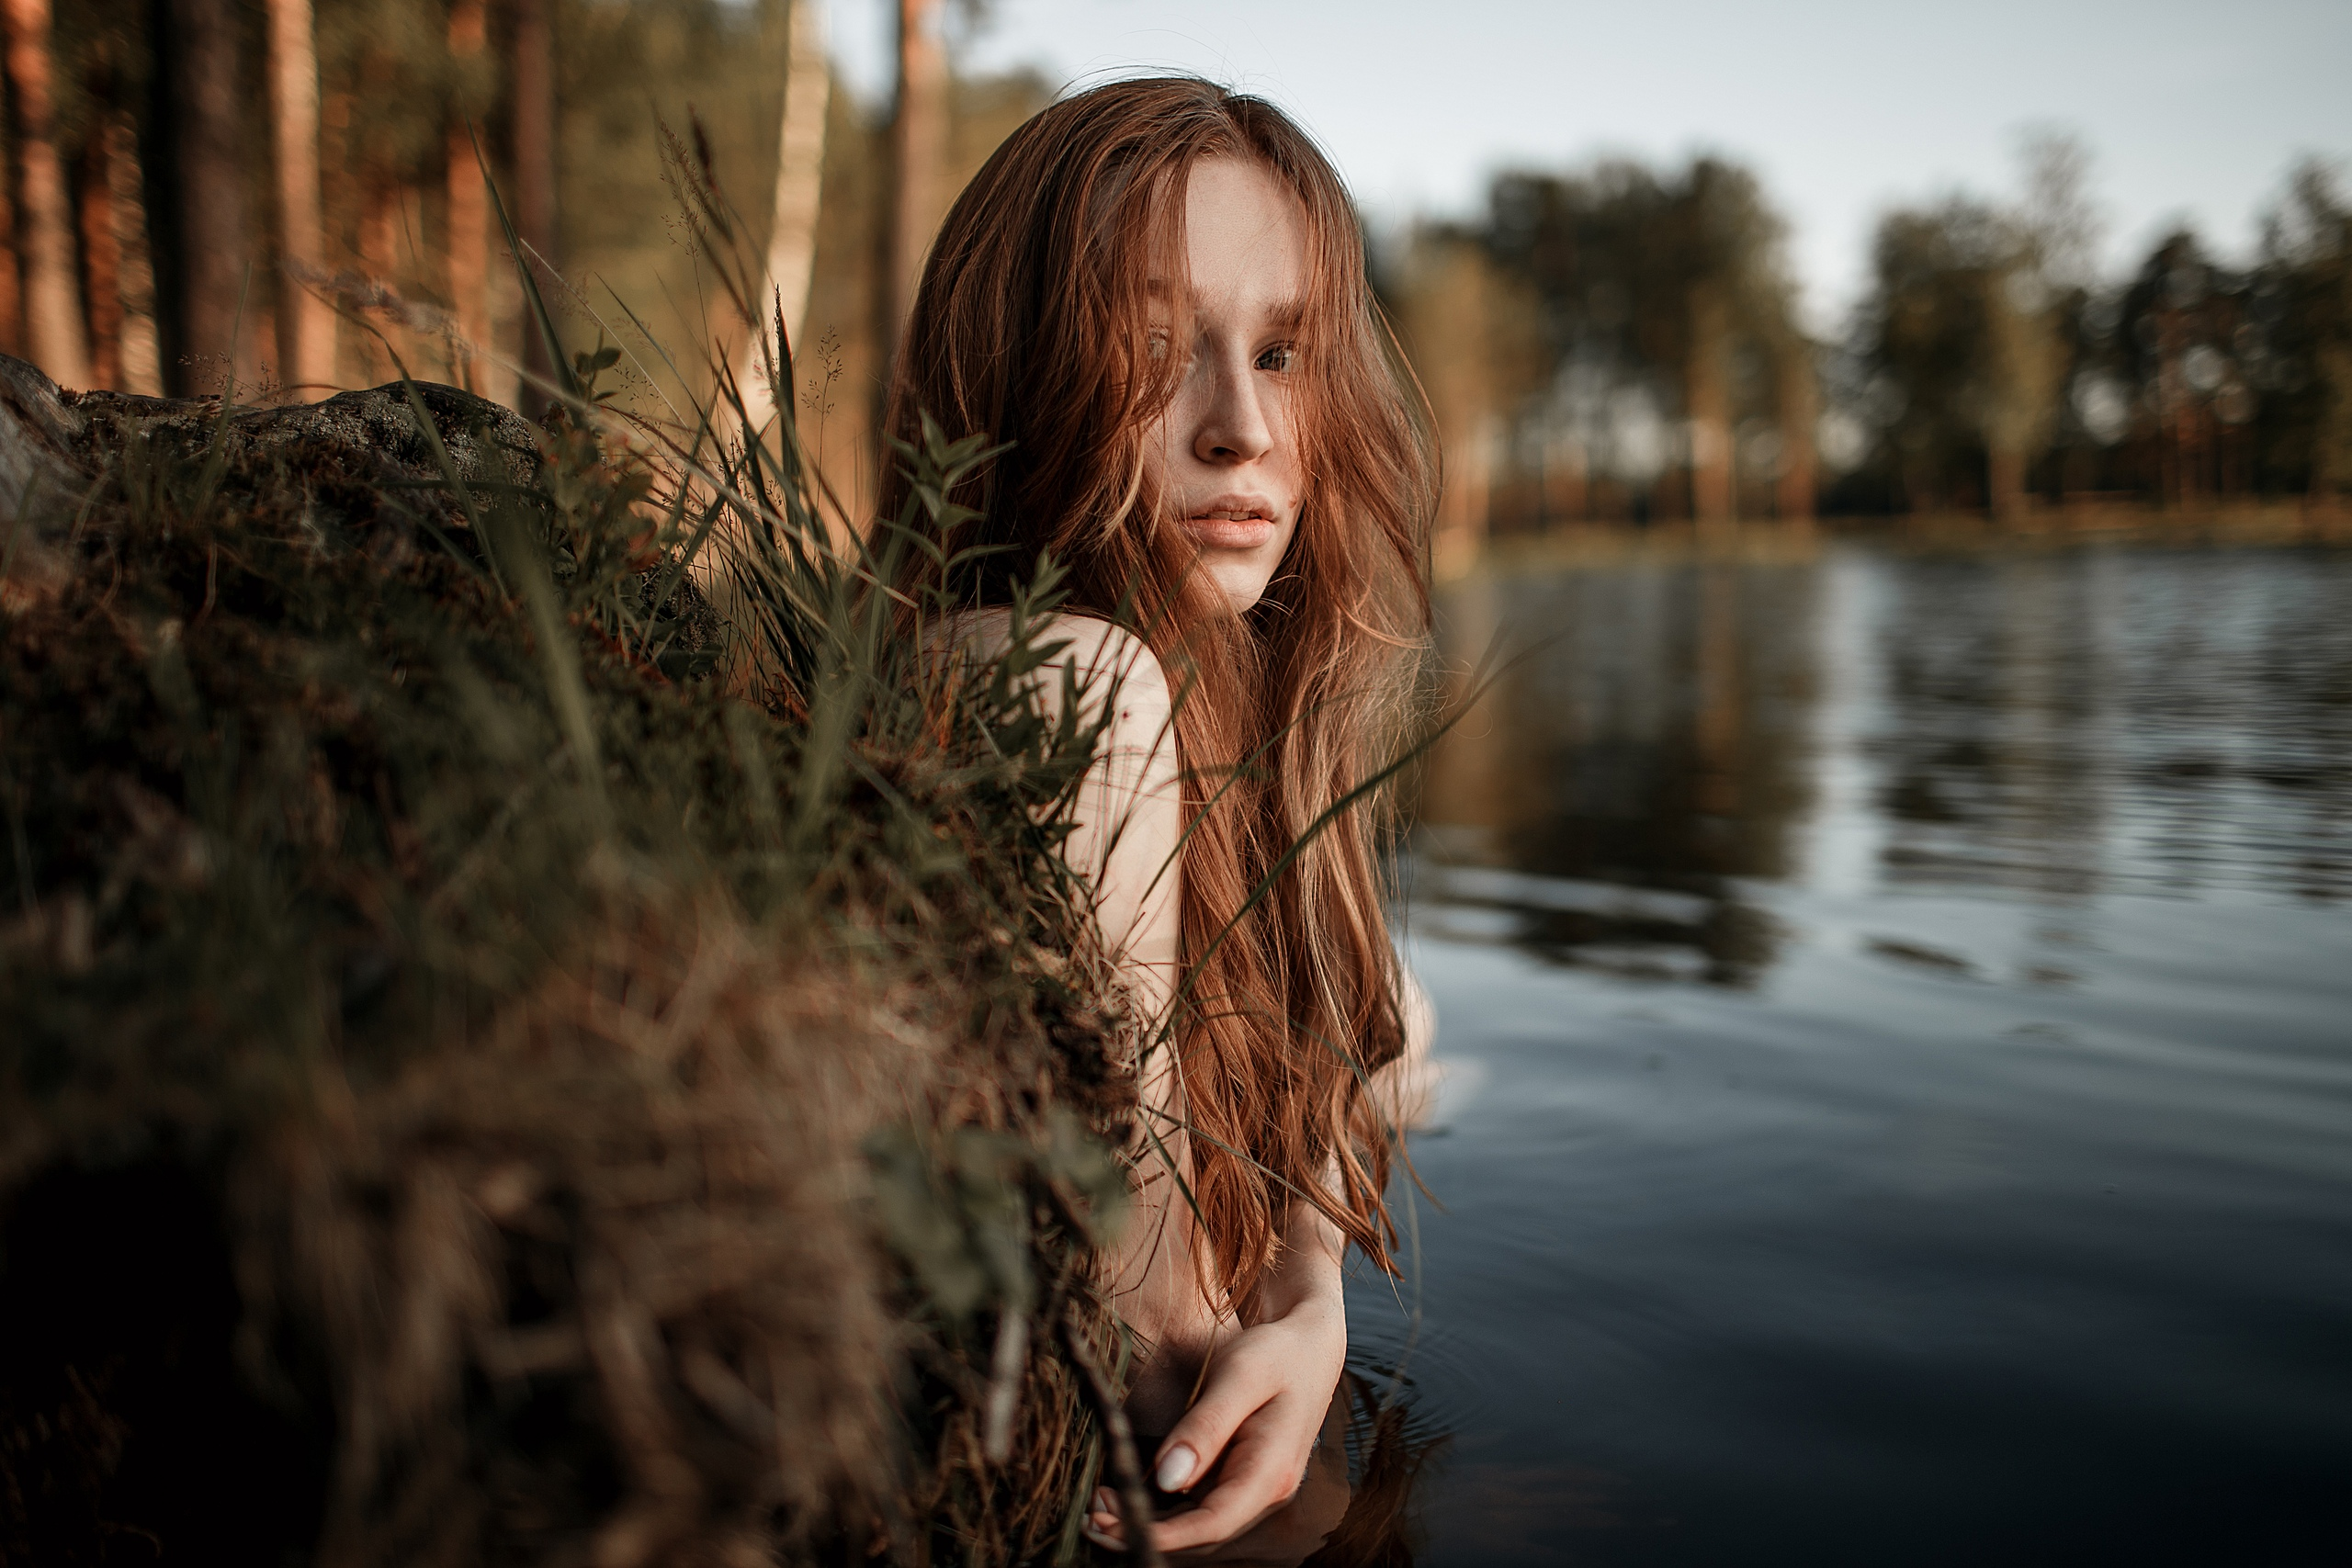 Women Model Redhead Parted Lips Looking Away Lake Depth Of Field Portrait Outdoors Women Outdoors 2560x1707